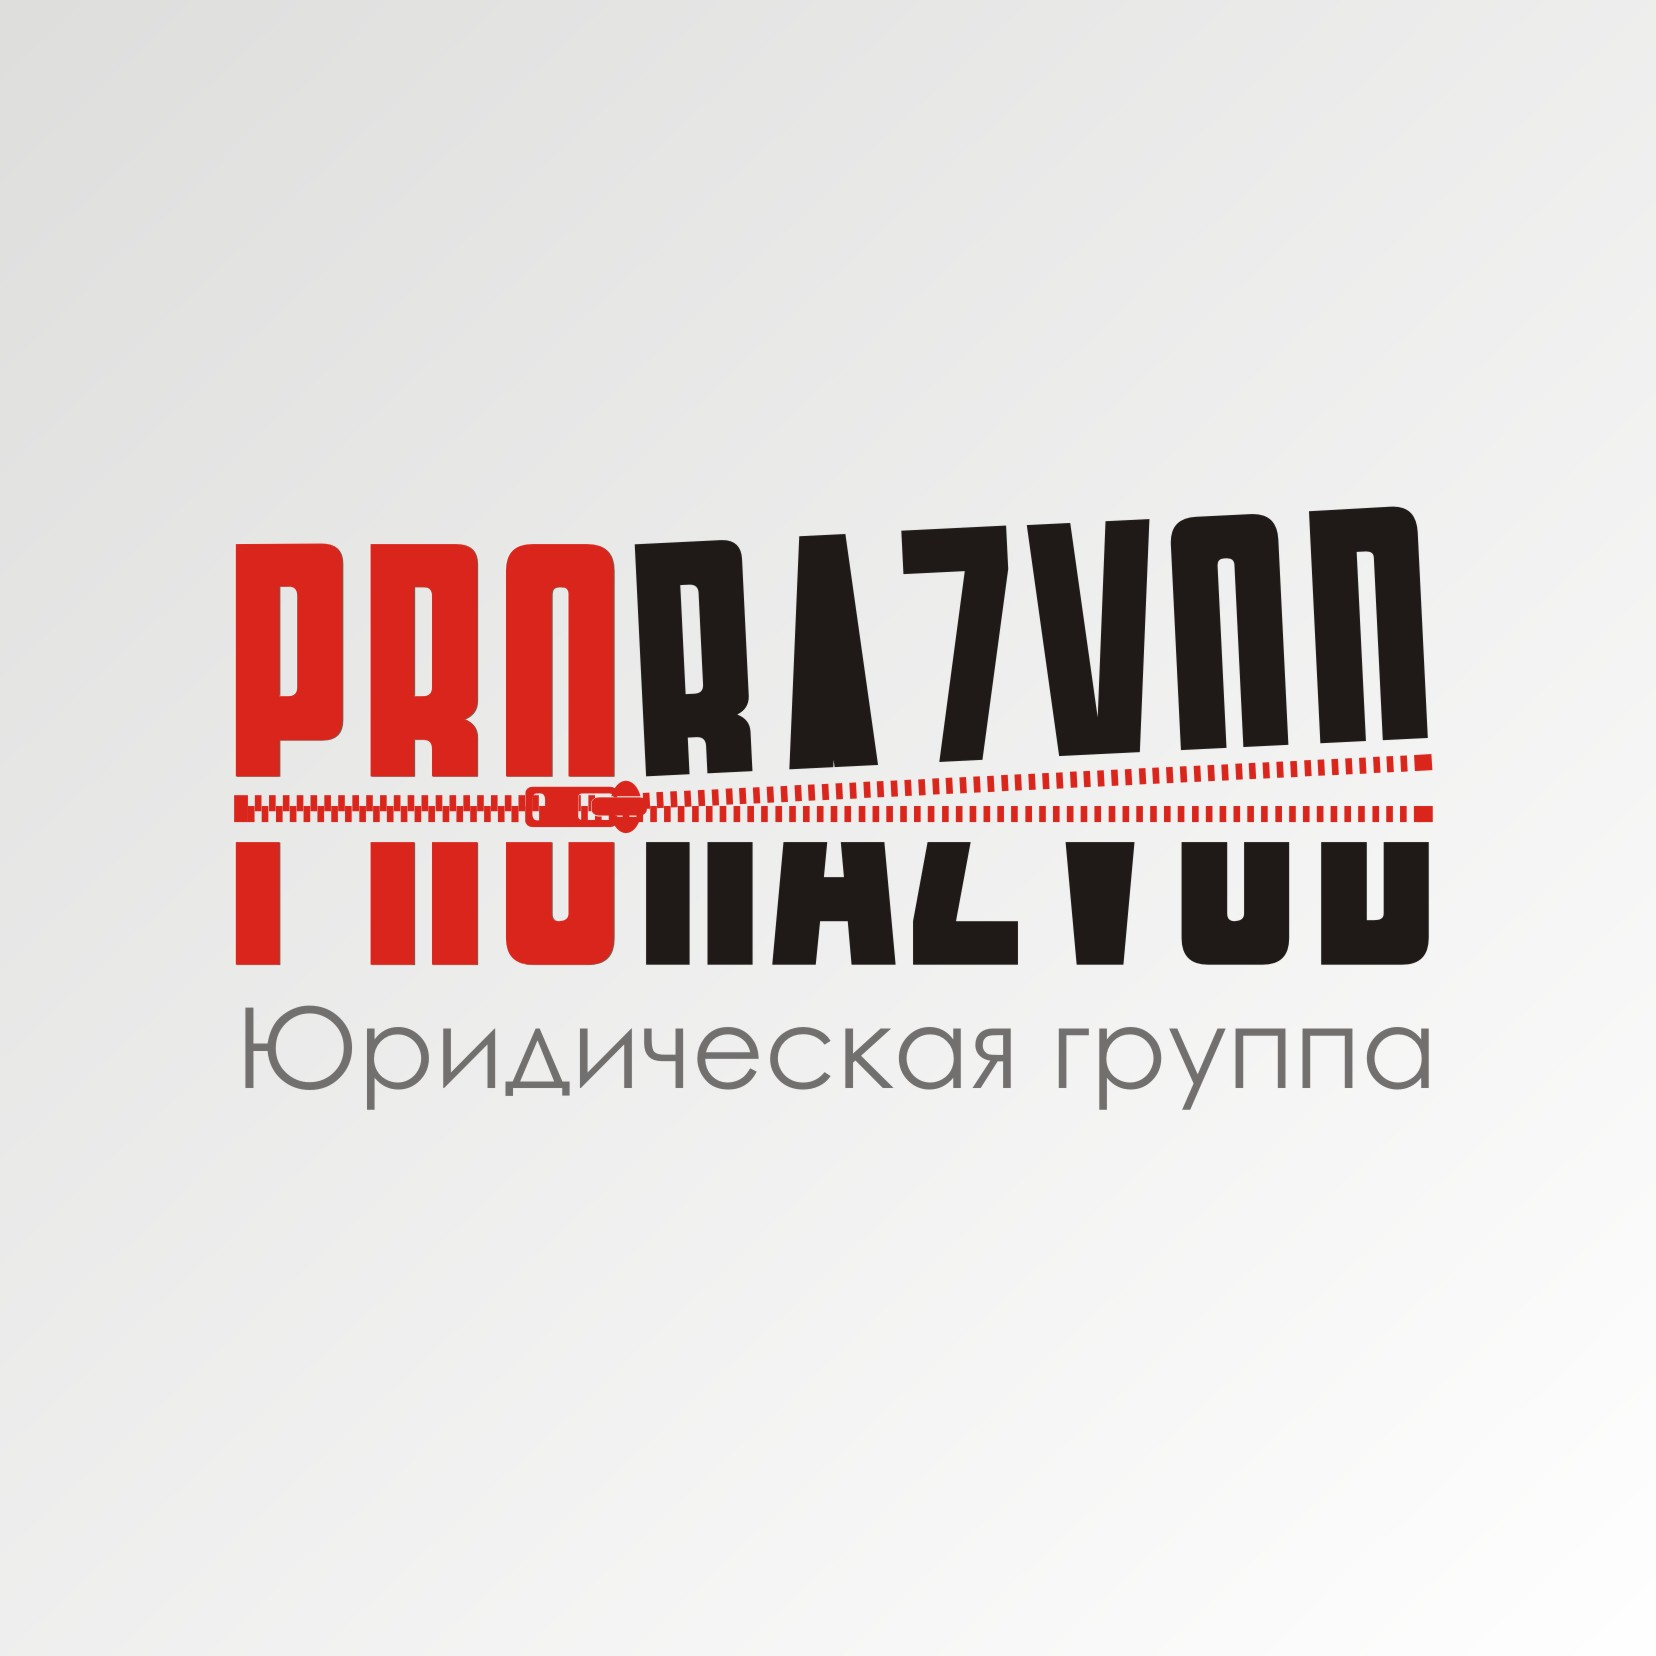 Логотип и фирм стиль для бракоразводного агенства. фото f_82558769a3ebe838.jpg